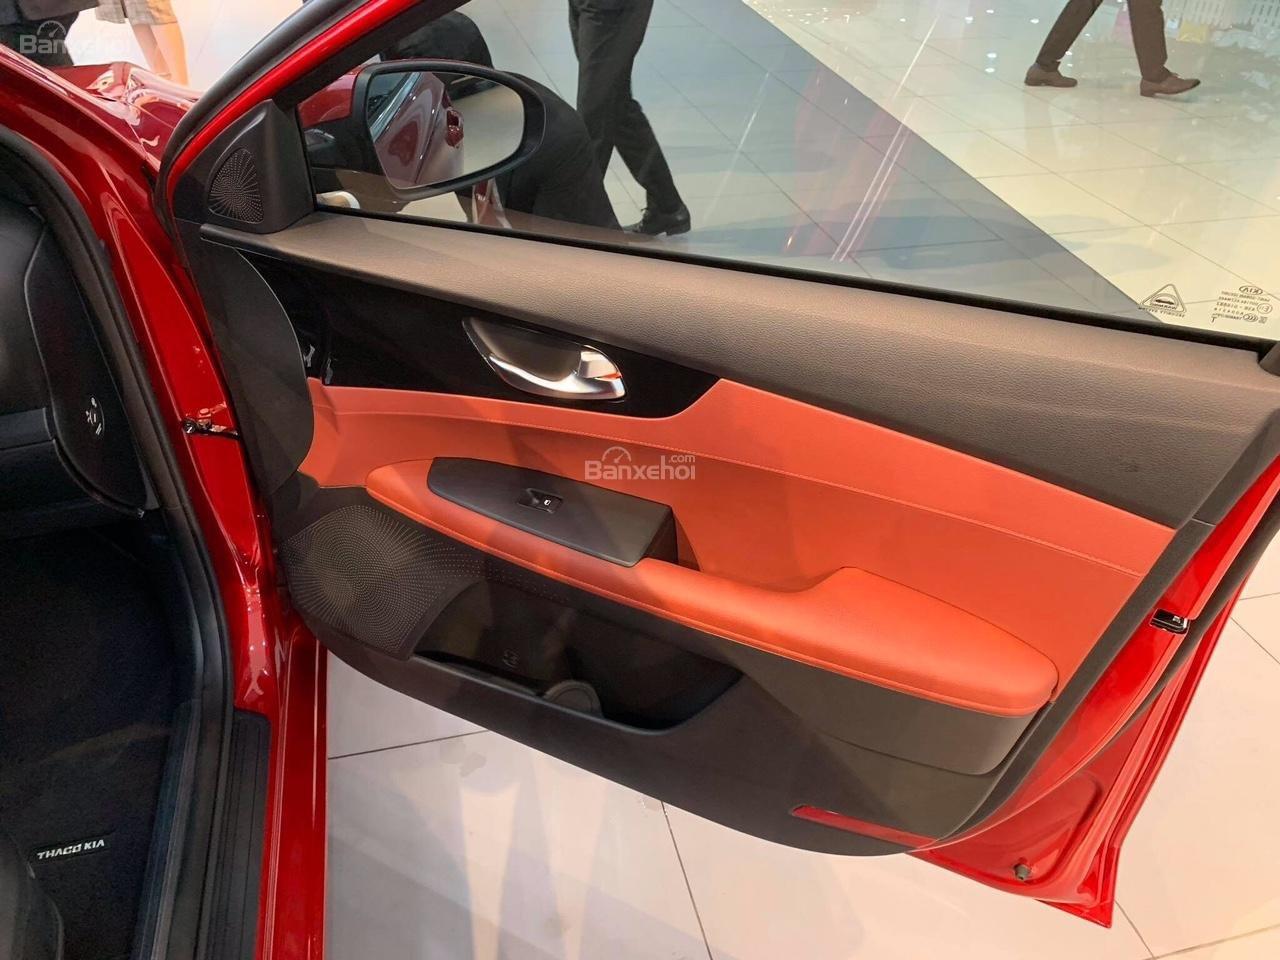 Bán Kia Cerato đời 2019 All New - Giao xe trước Tết-7